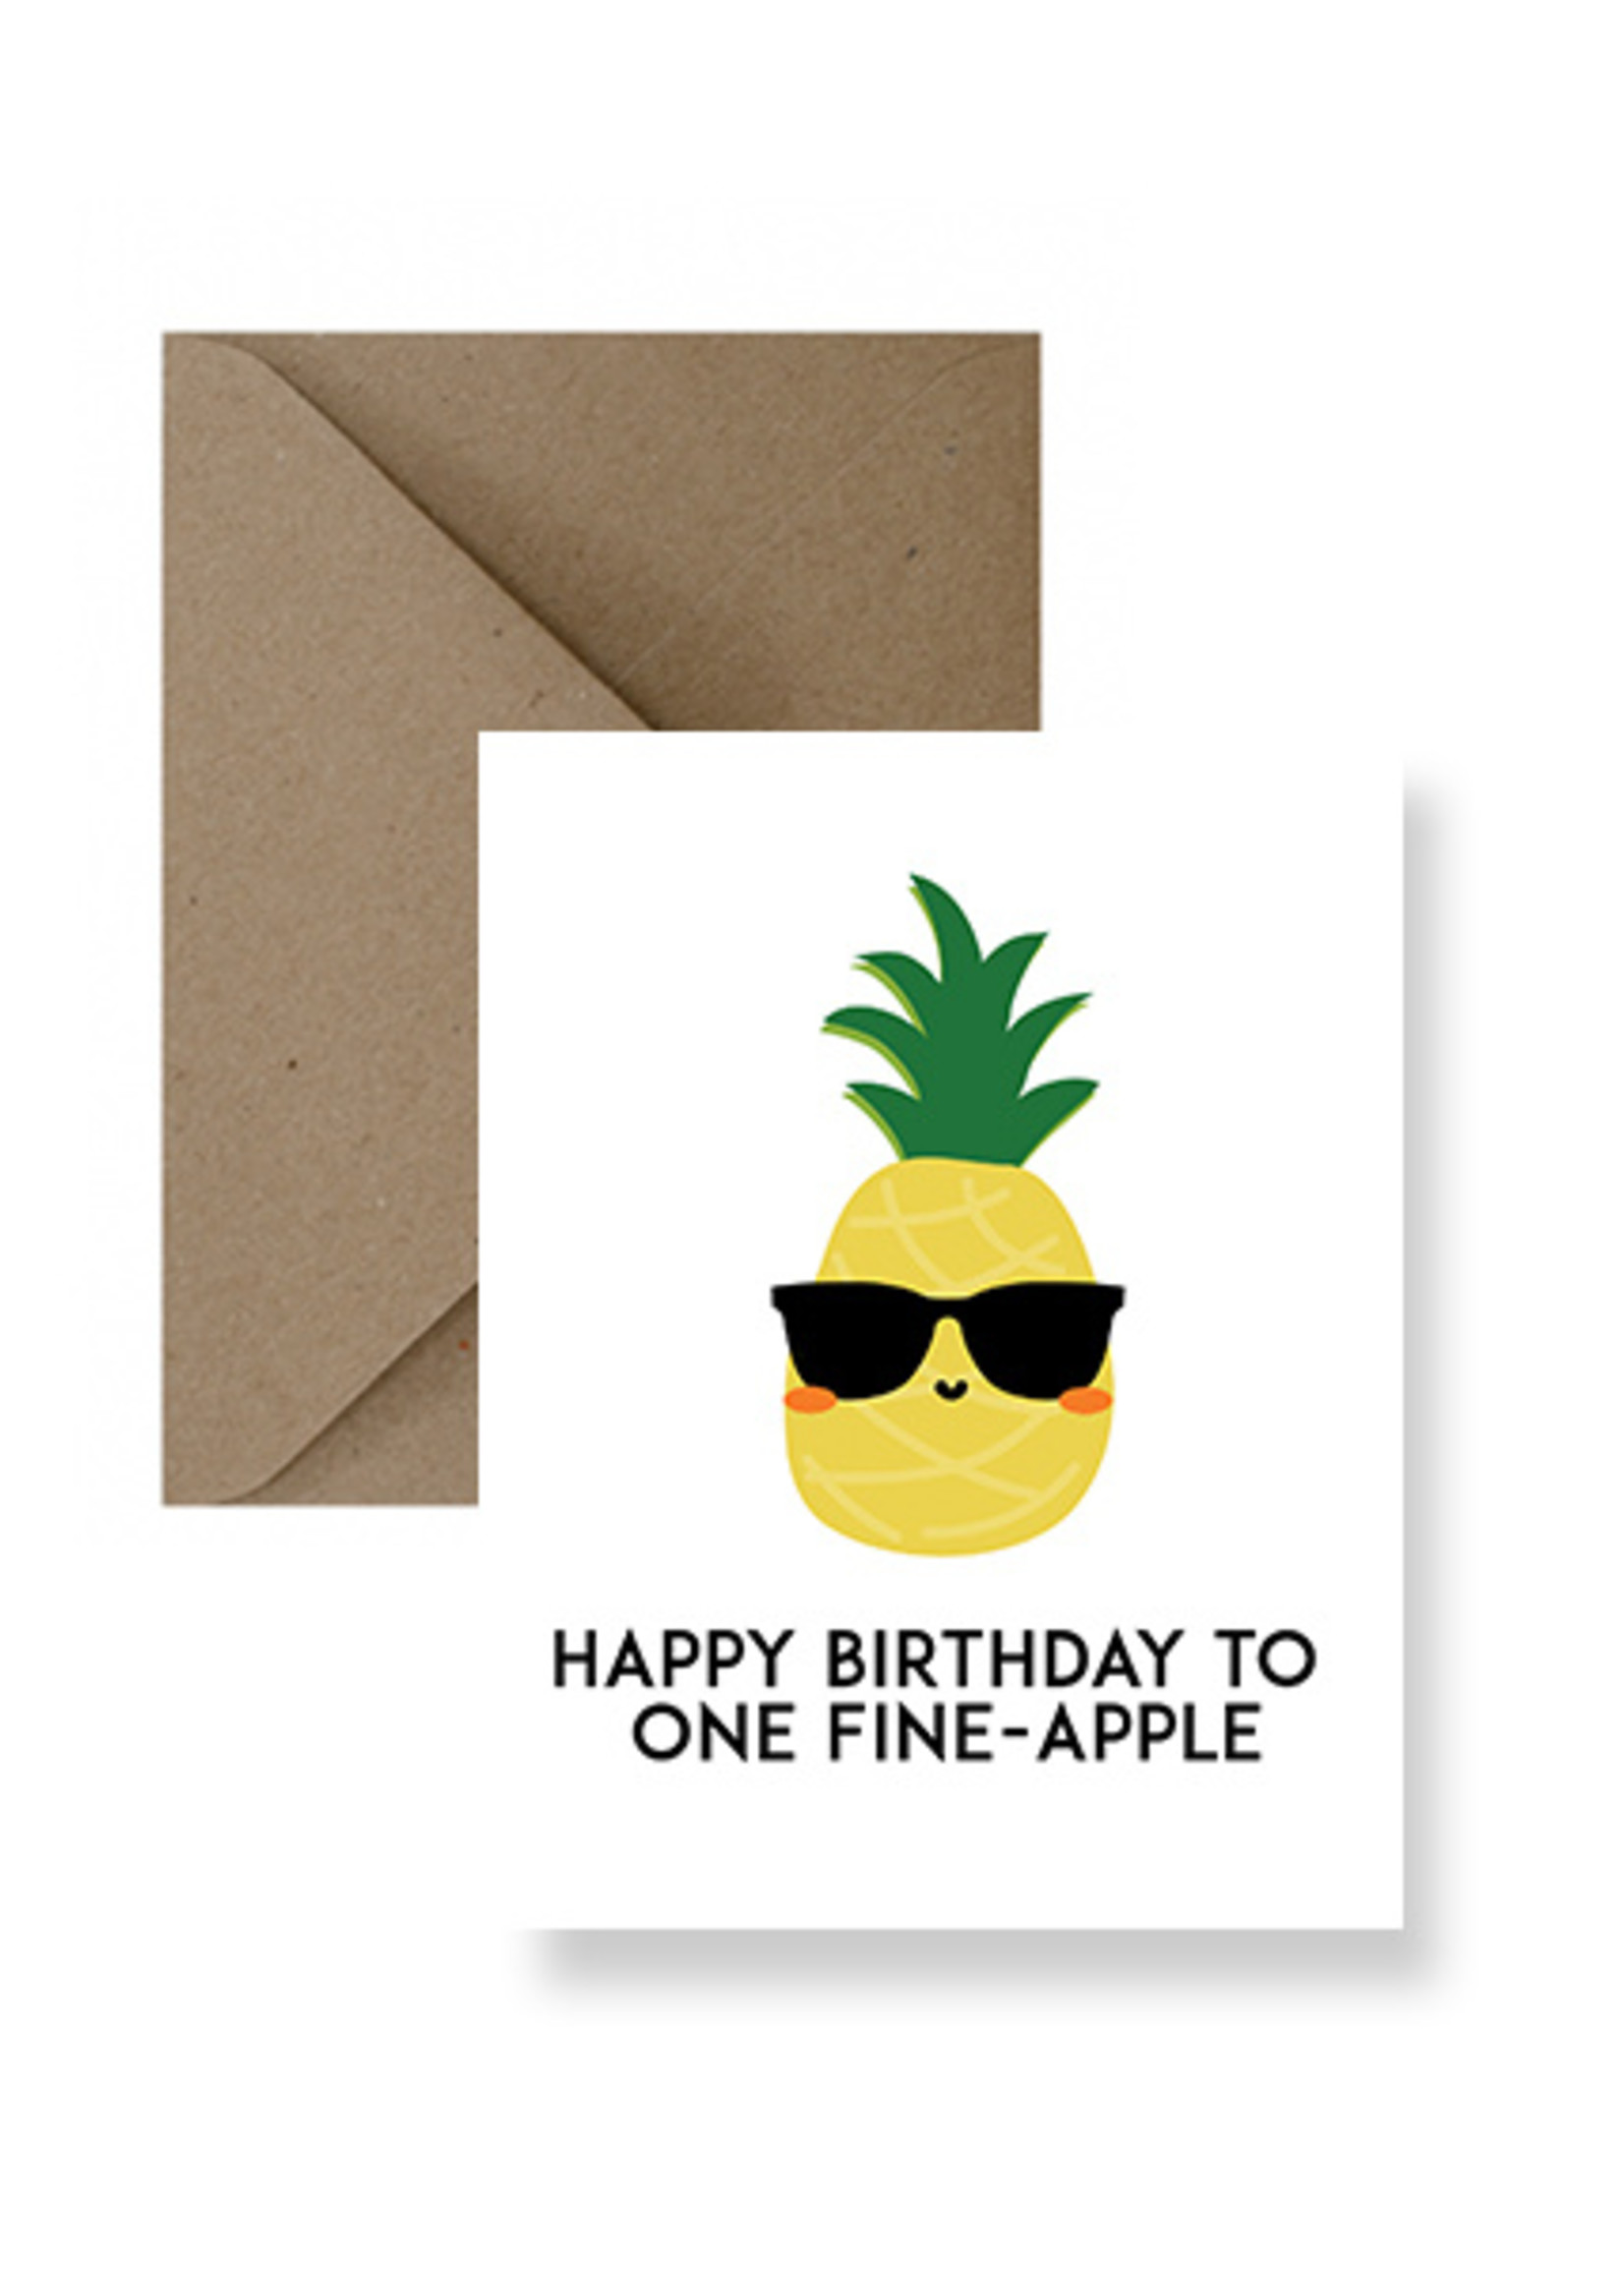 IMPAPER Fine-Apple Birthday Card